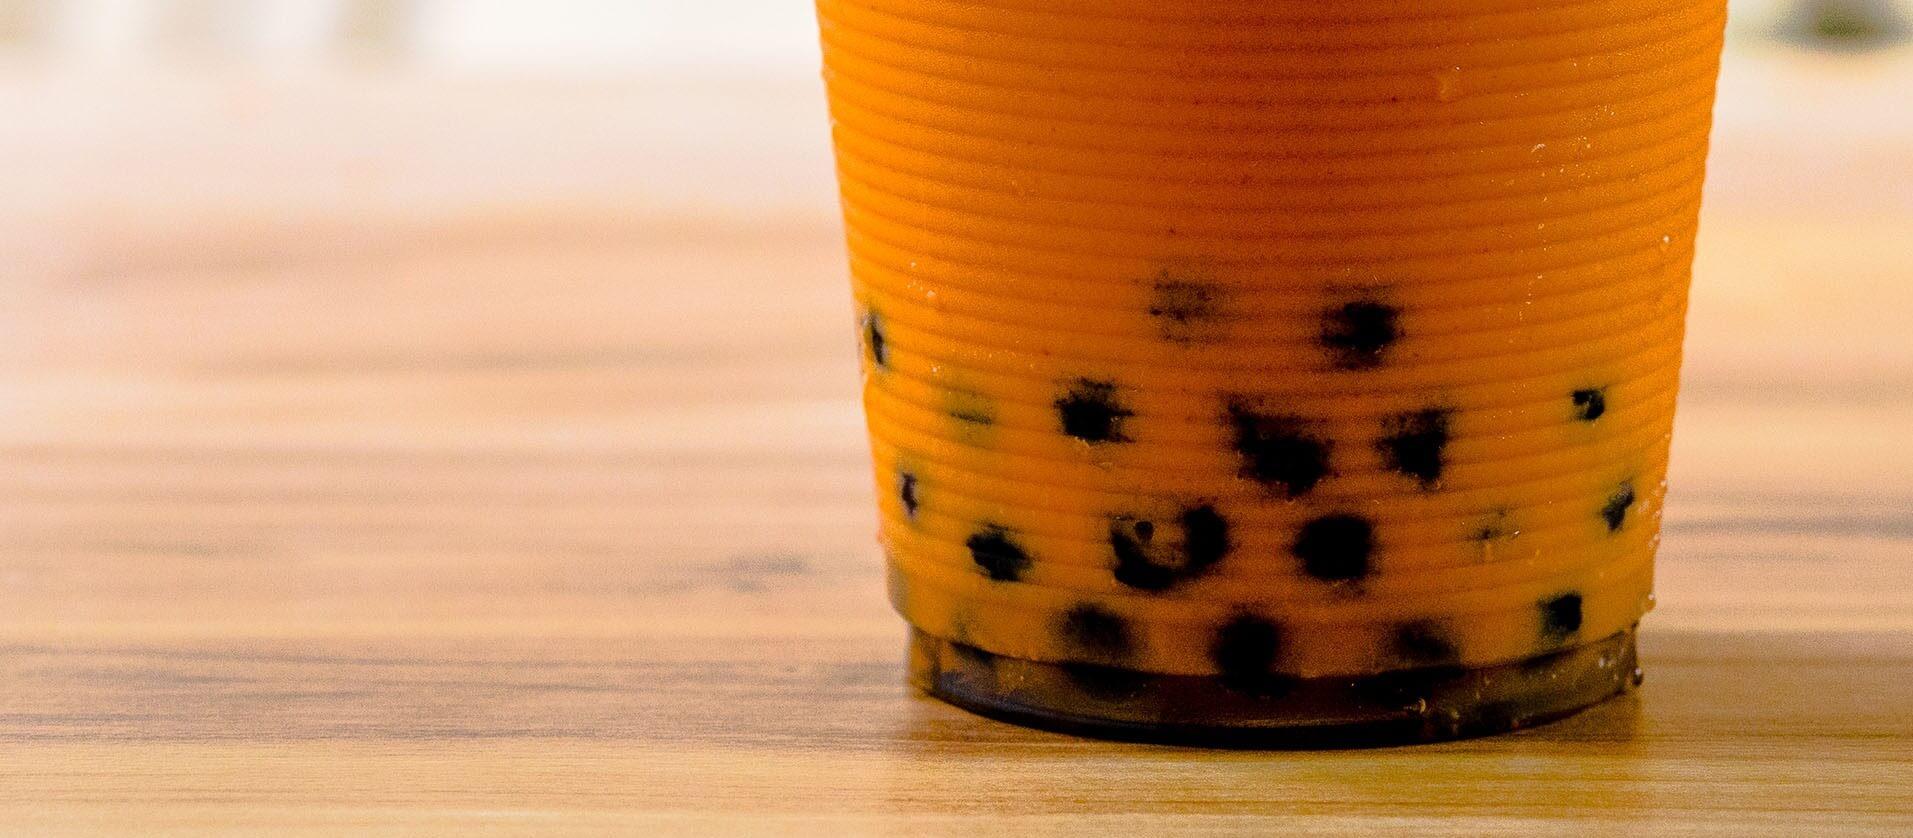 Xiangpiaopiao new self heating bubble tea - food tech news in Asia